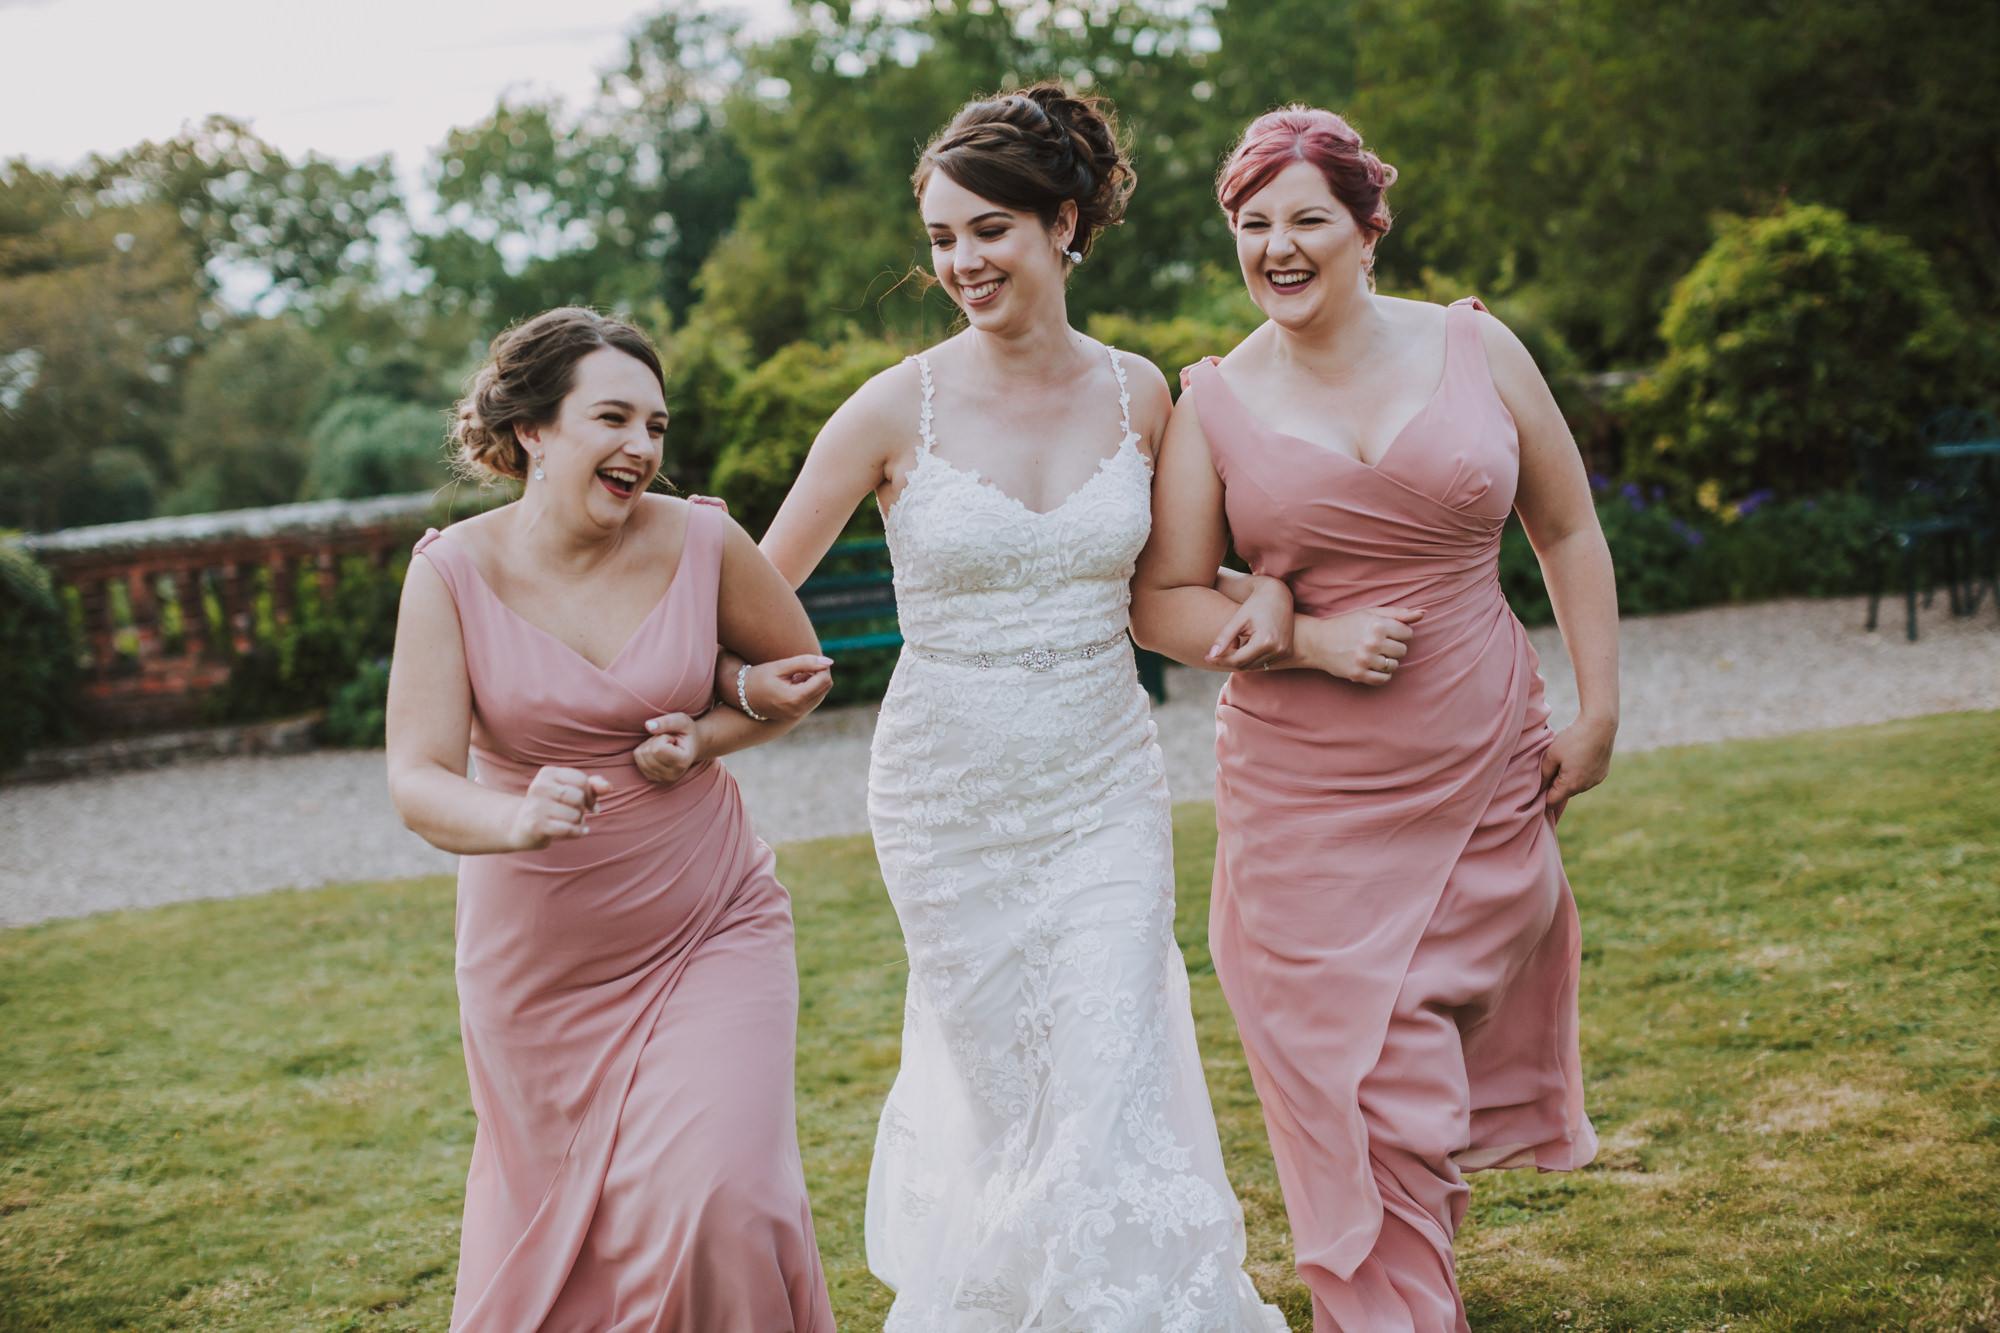 hodsock priory wedding photographers blog95.jpg